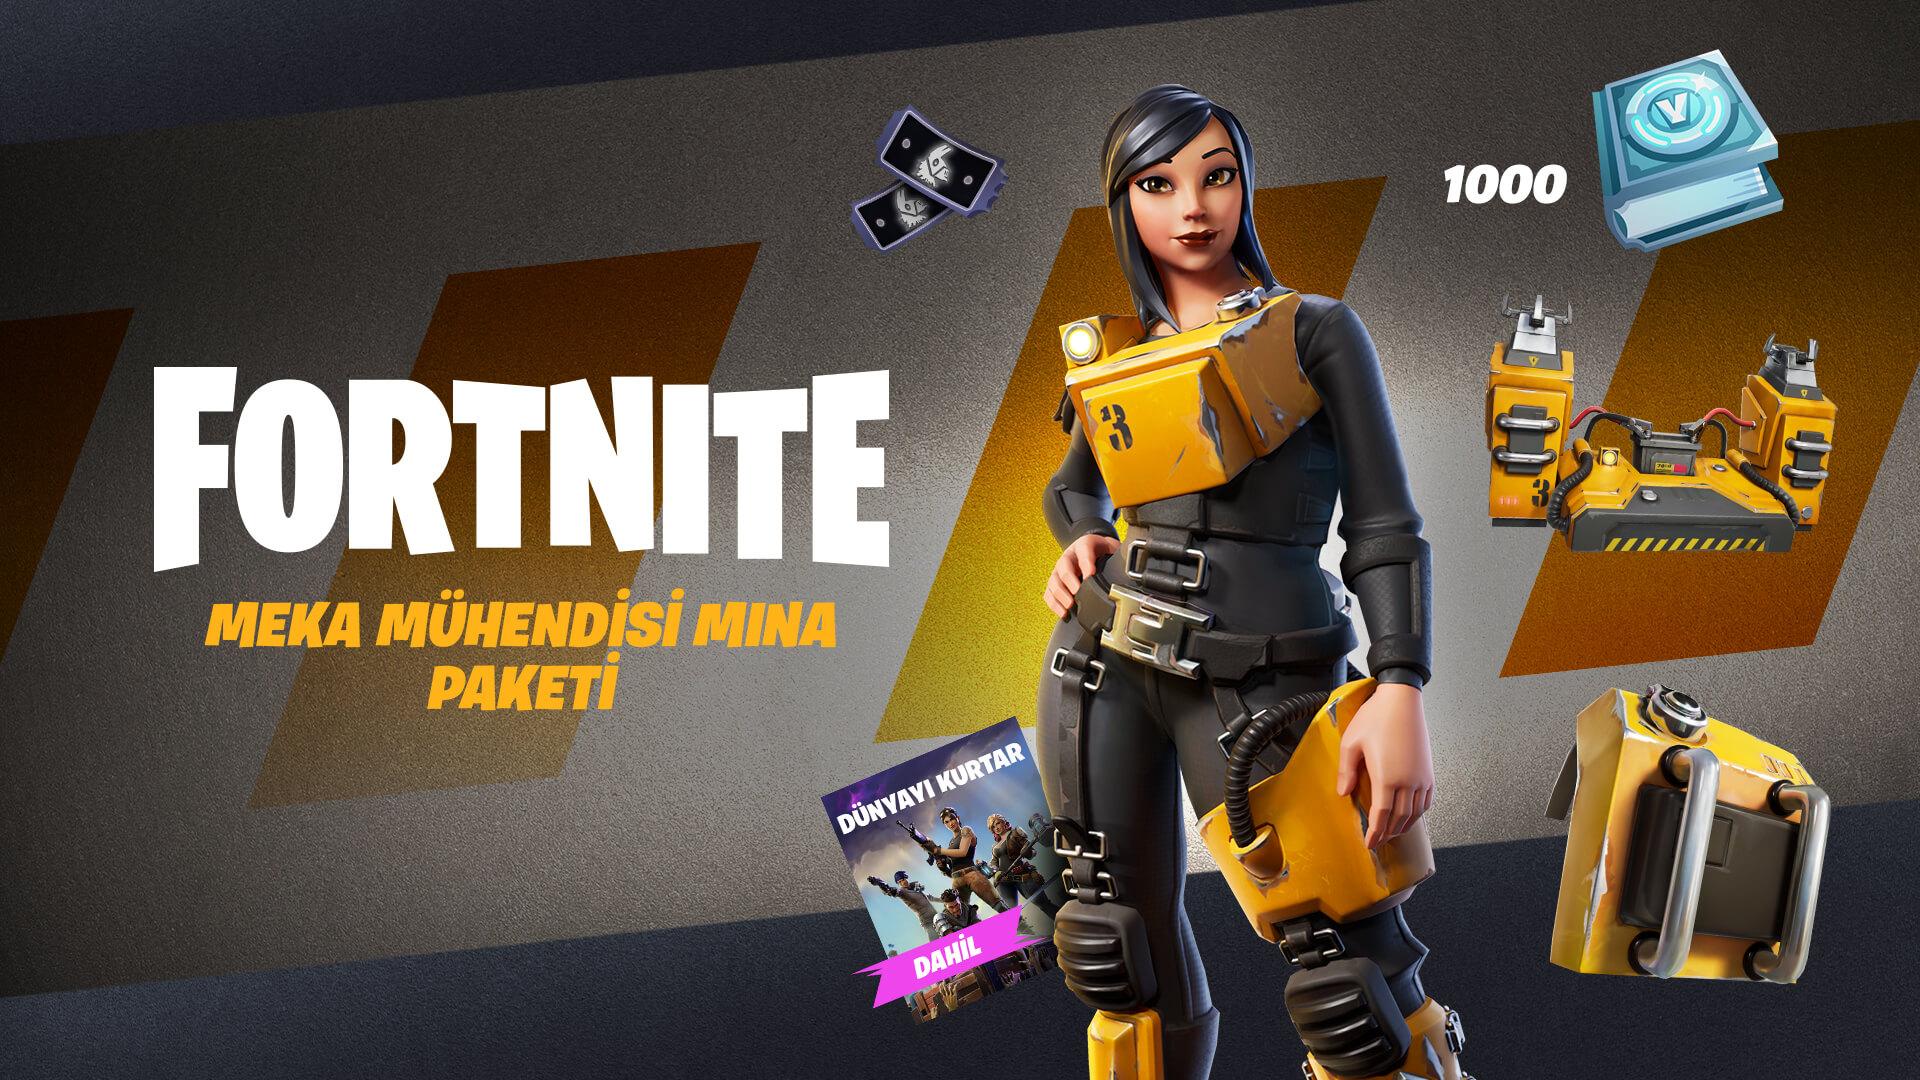 Fortnite Save The World Machinist Mina Pack TR